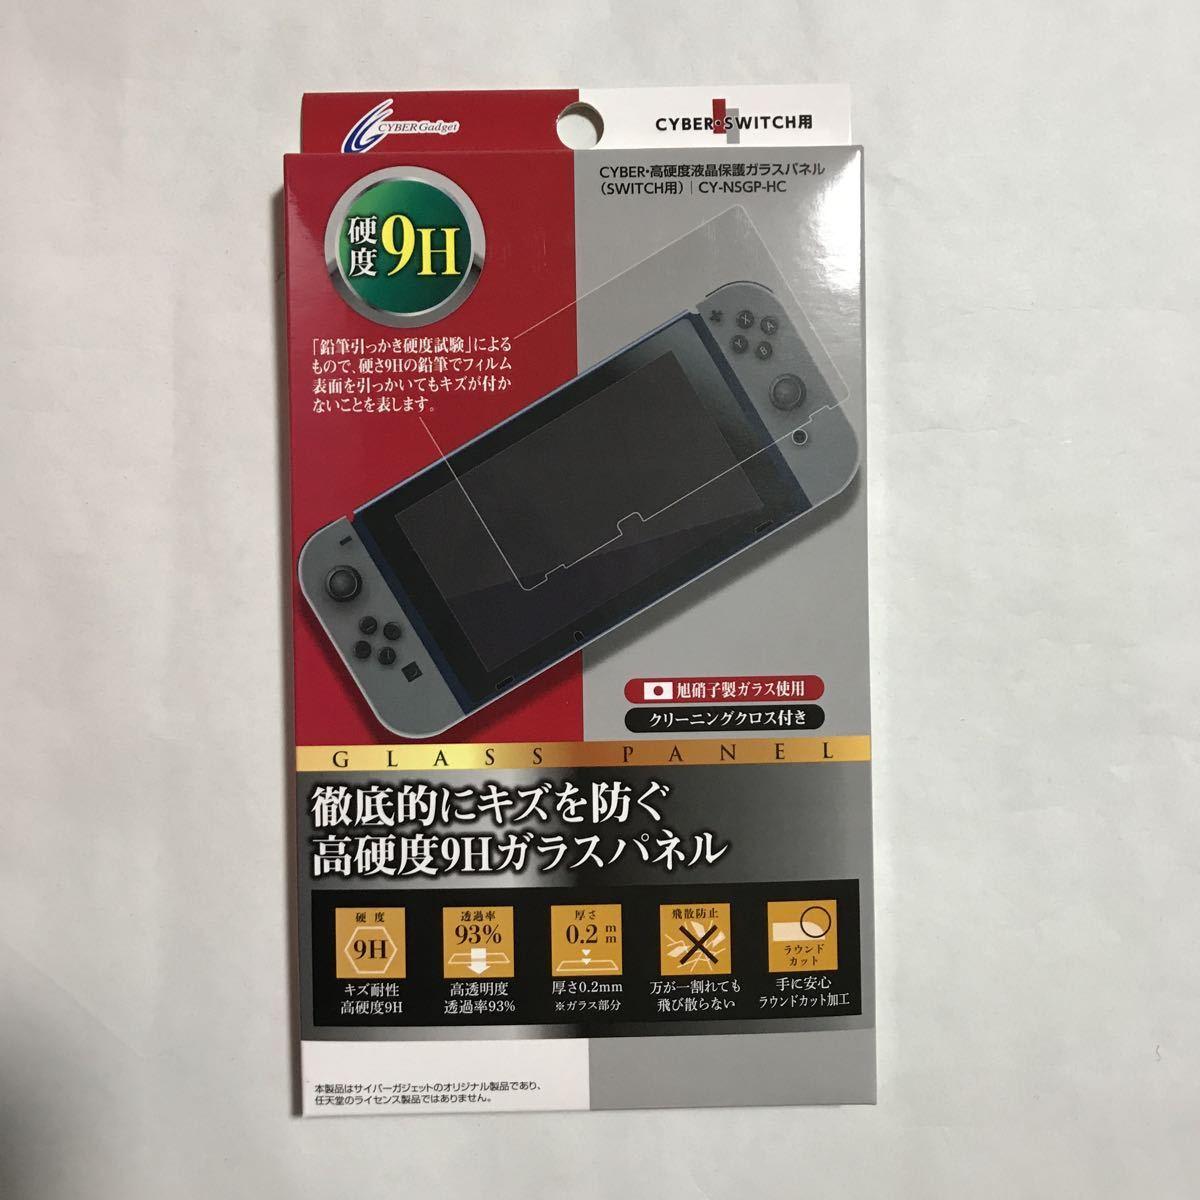 Nintendo Switch本体Joy-Con(L)ネオンブルー/(R)ネオンレッド新型 おまけ付 [新品未開封] 送料無料 ニンテンドースイッチ本体 任天堂 _画像8